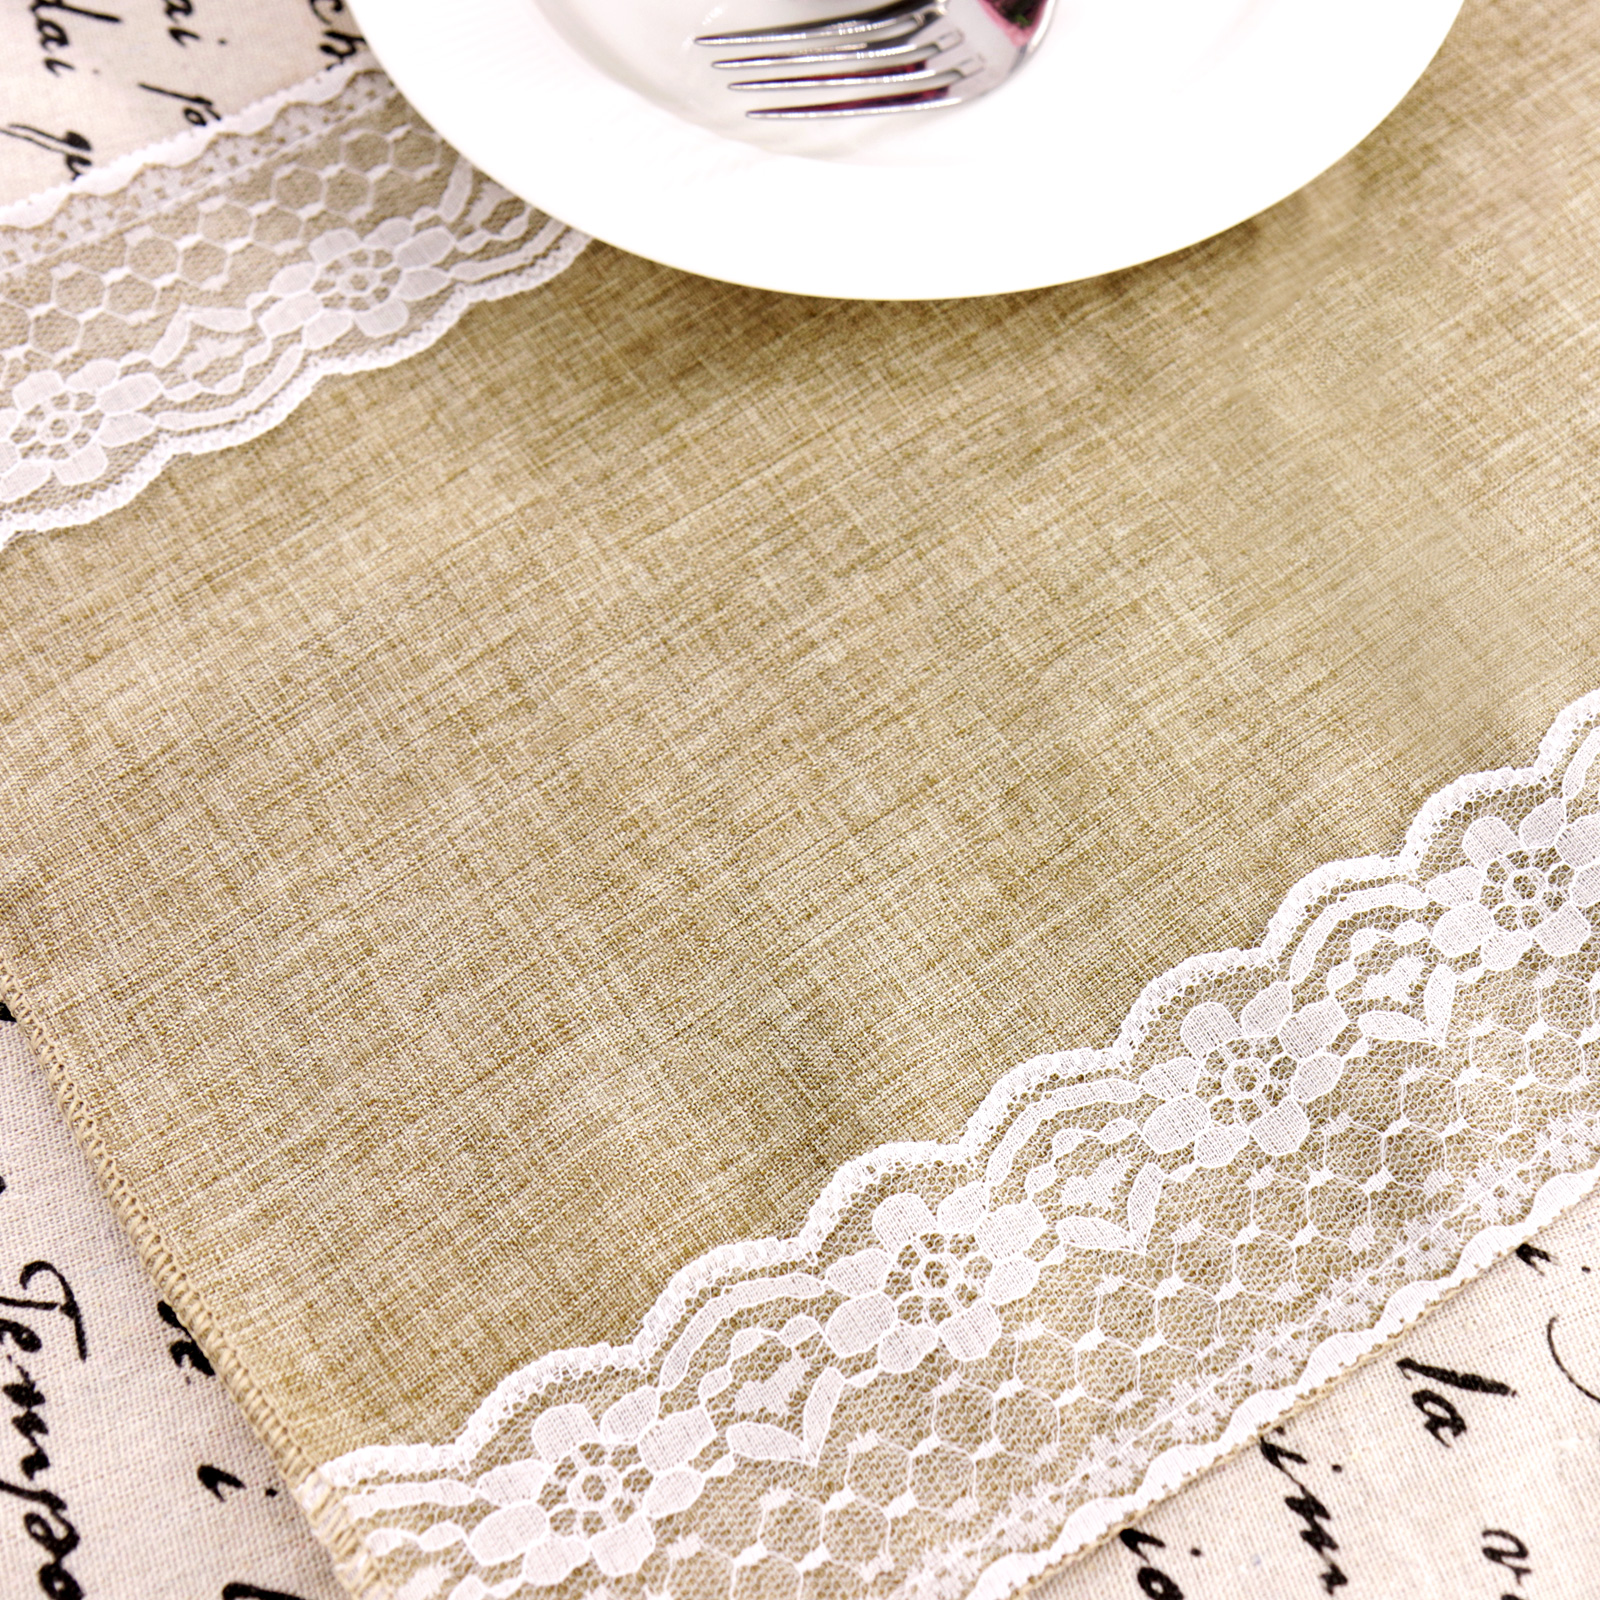 Vintage Burlap With Lace 30x275cm Tablecloths Table Runners Doilies Placemats